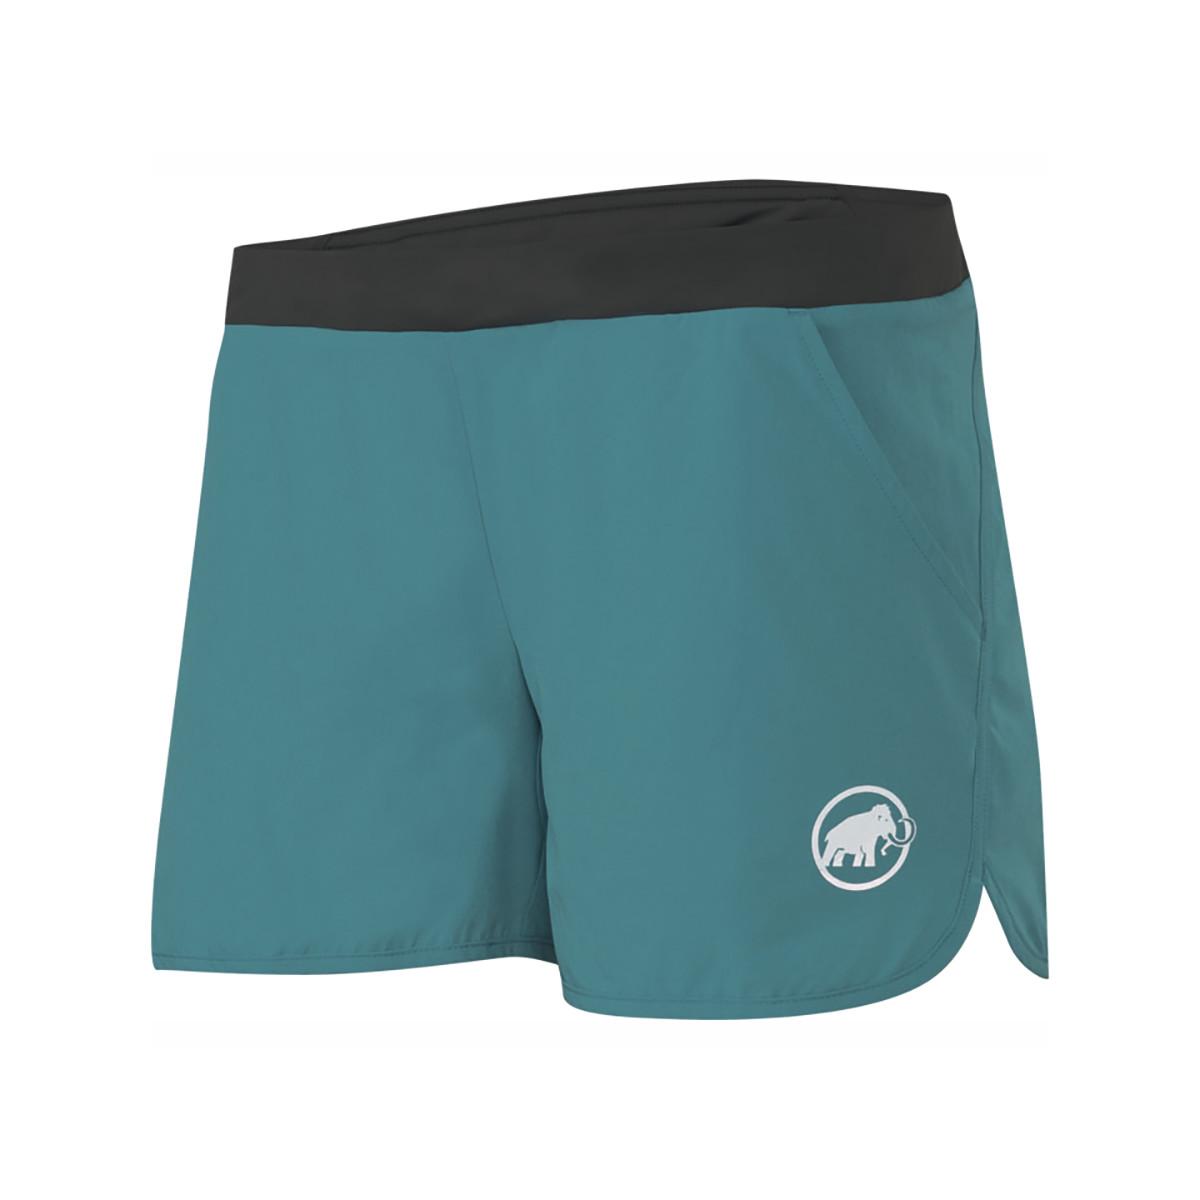 Mammut MTR 71 Shorts